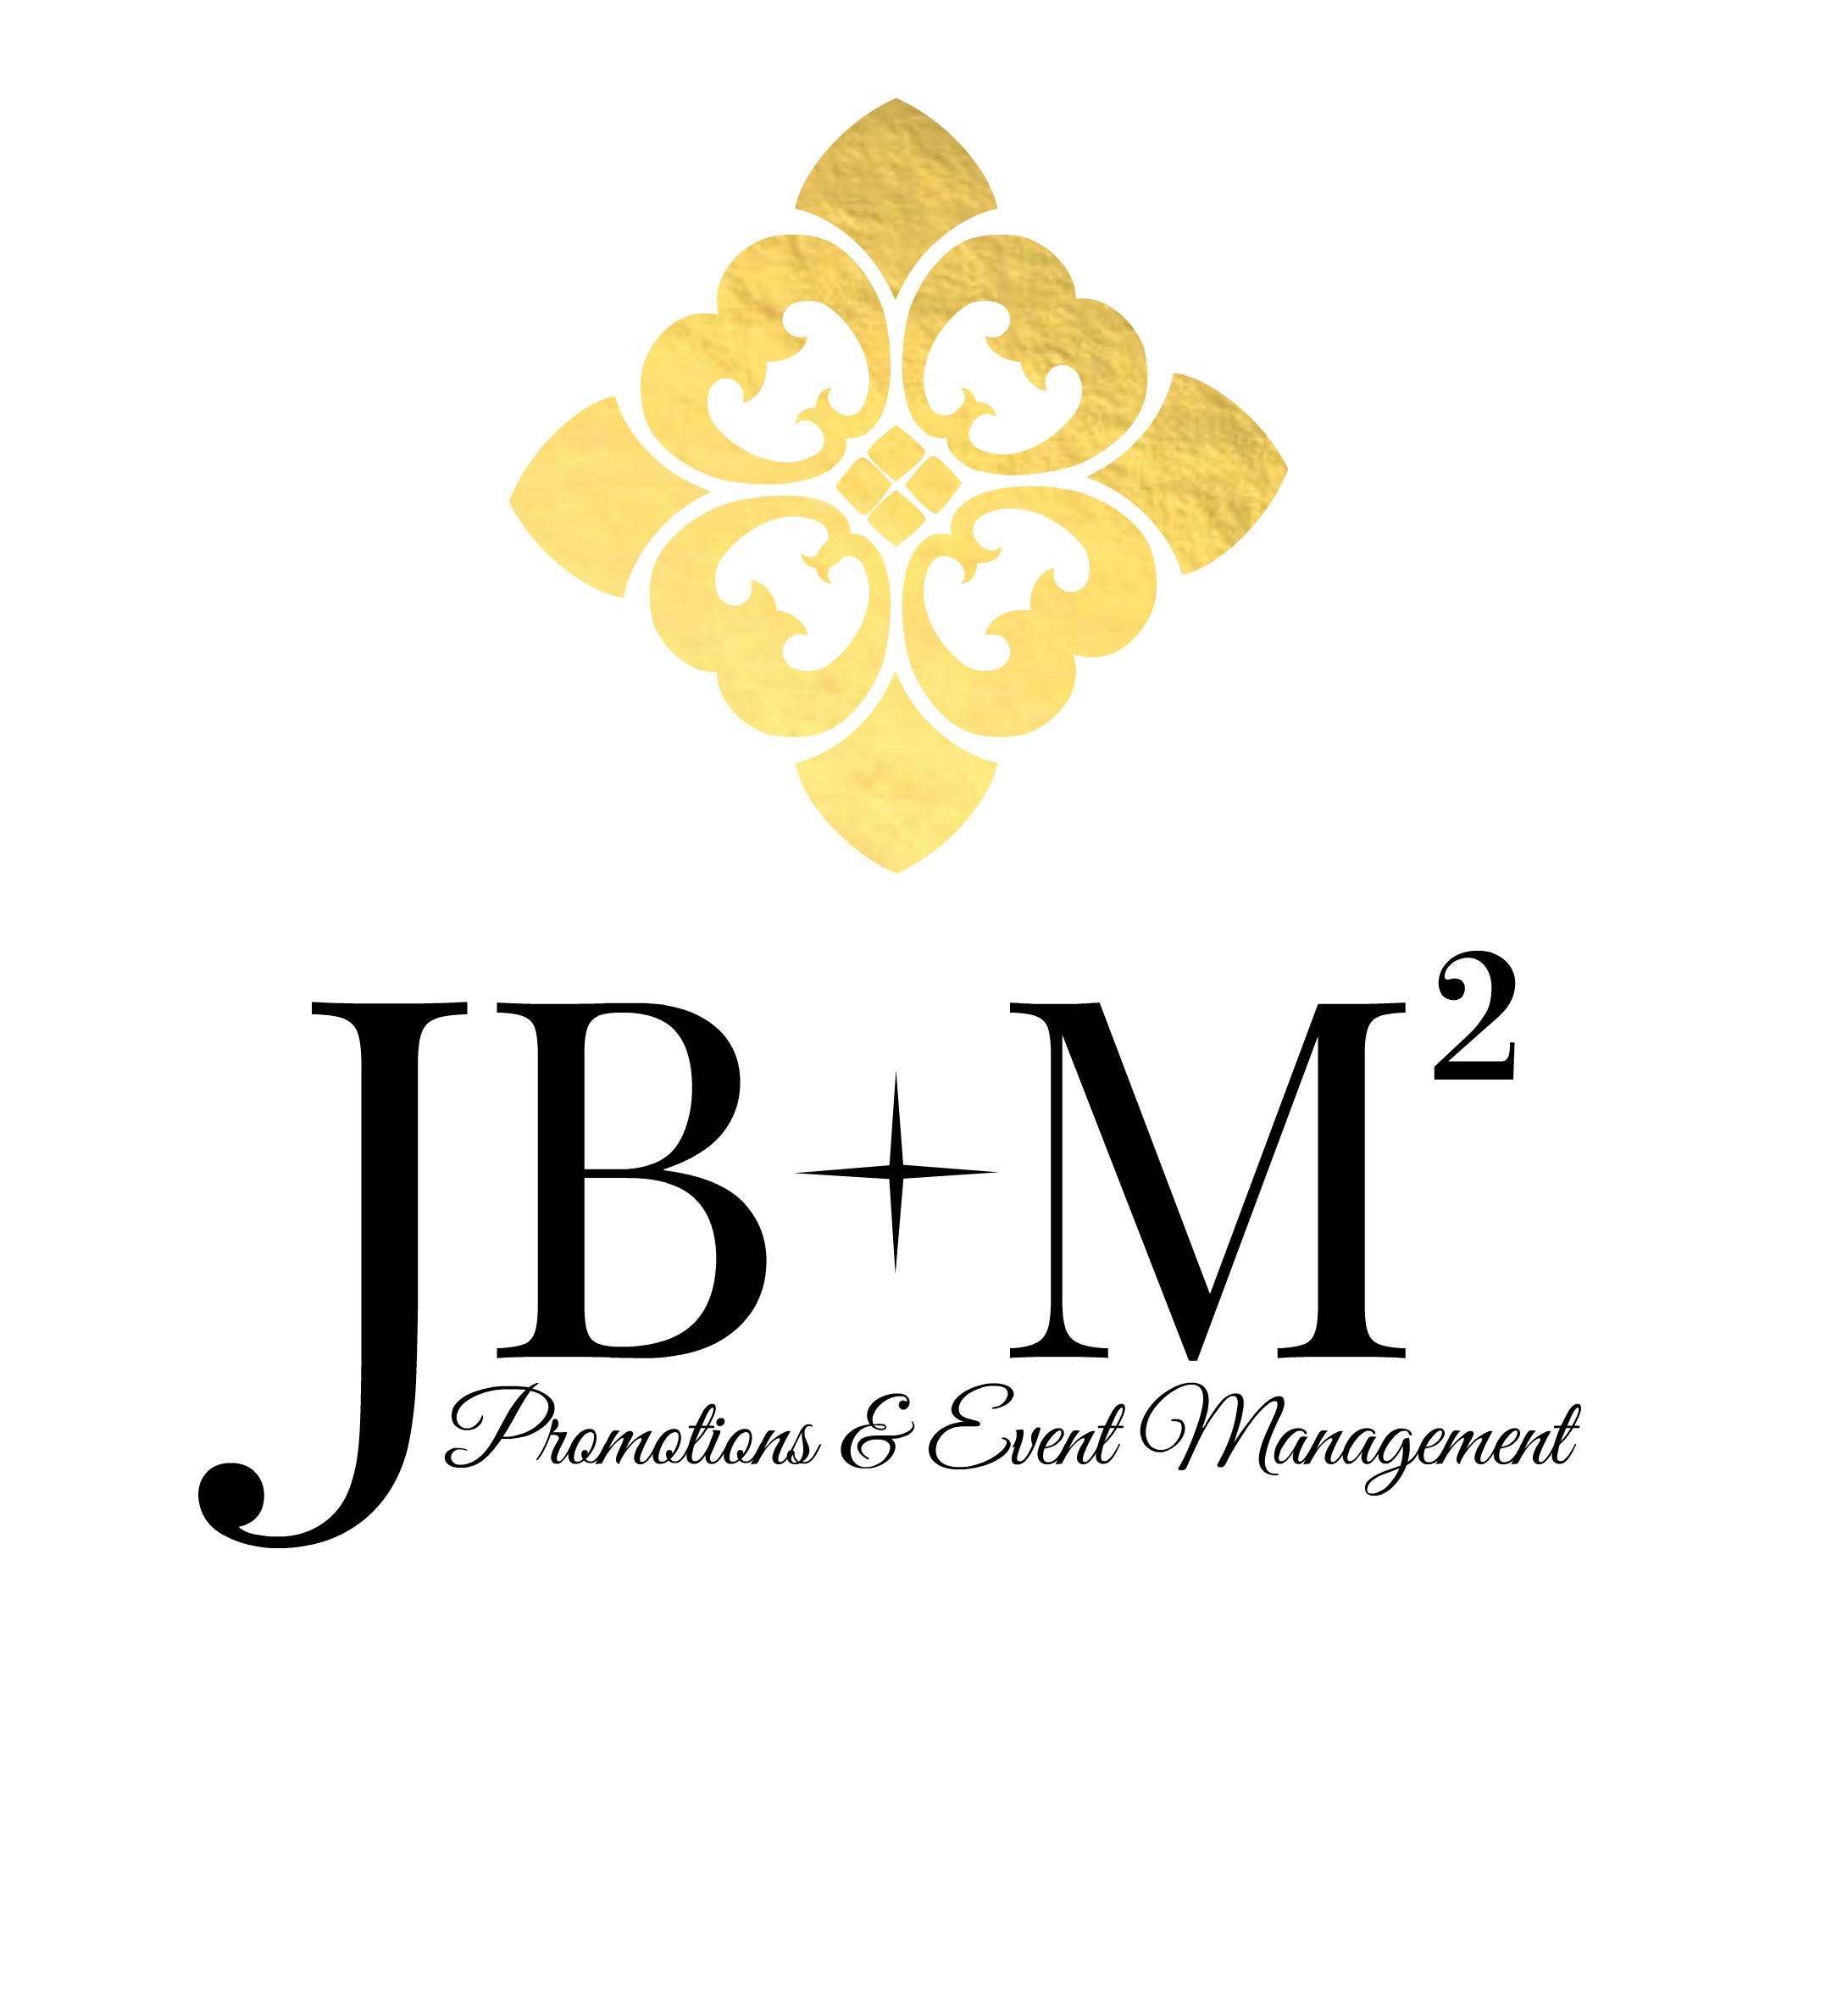 JBM2PROMOTIONS.COM